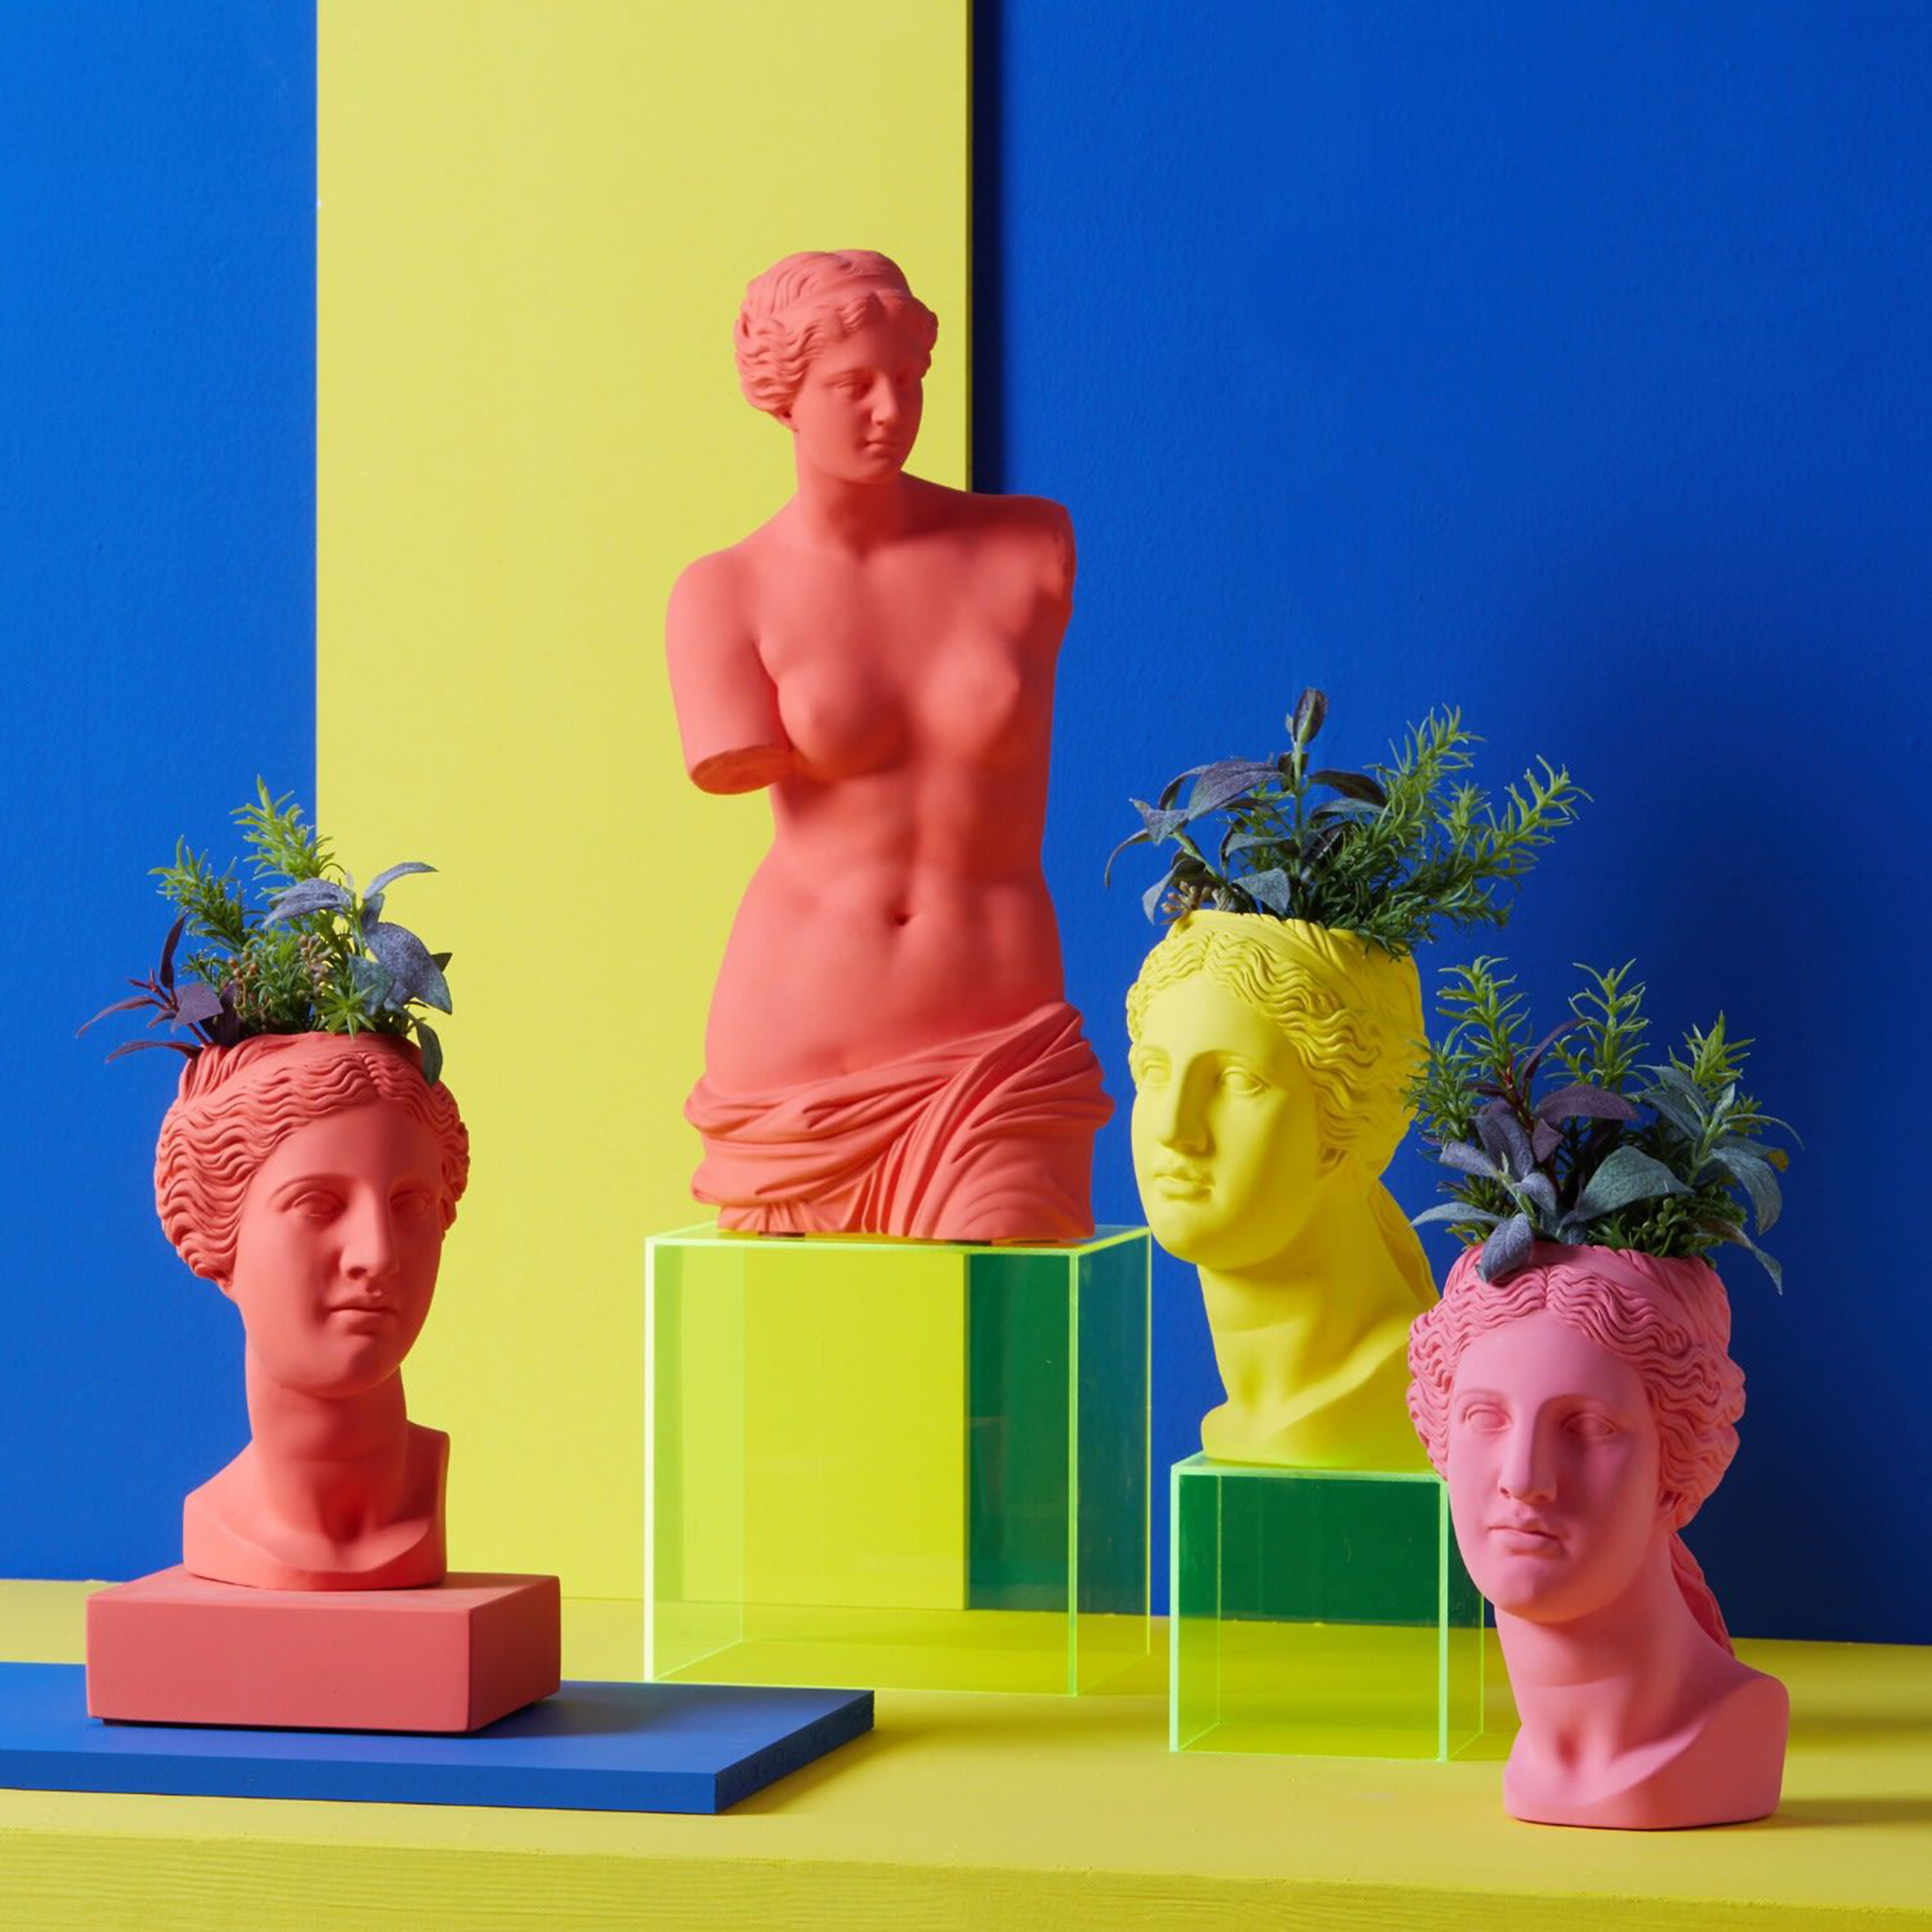 Greek and Roman influences on Modern Design